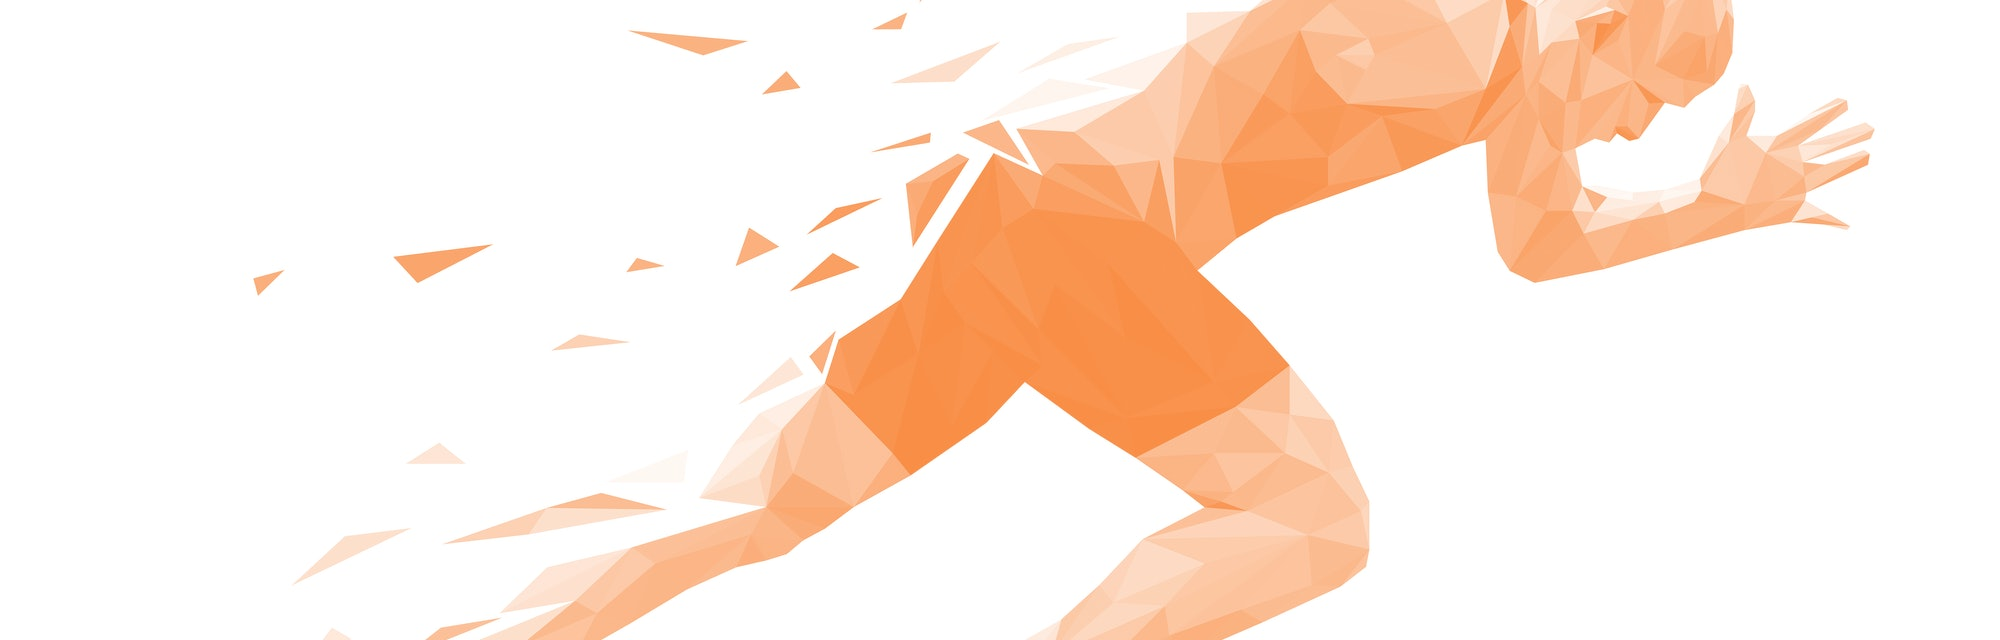 silhouette running man sprinter explosive start